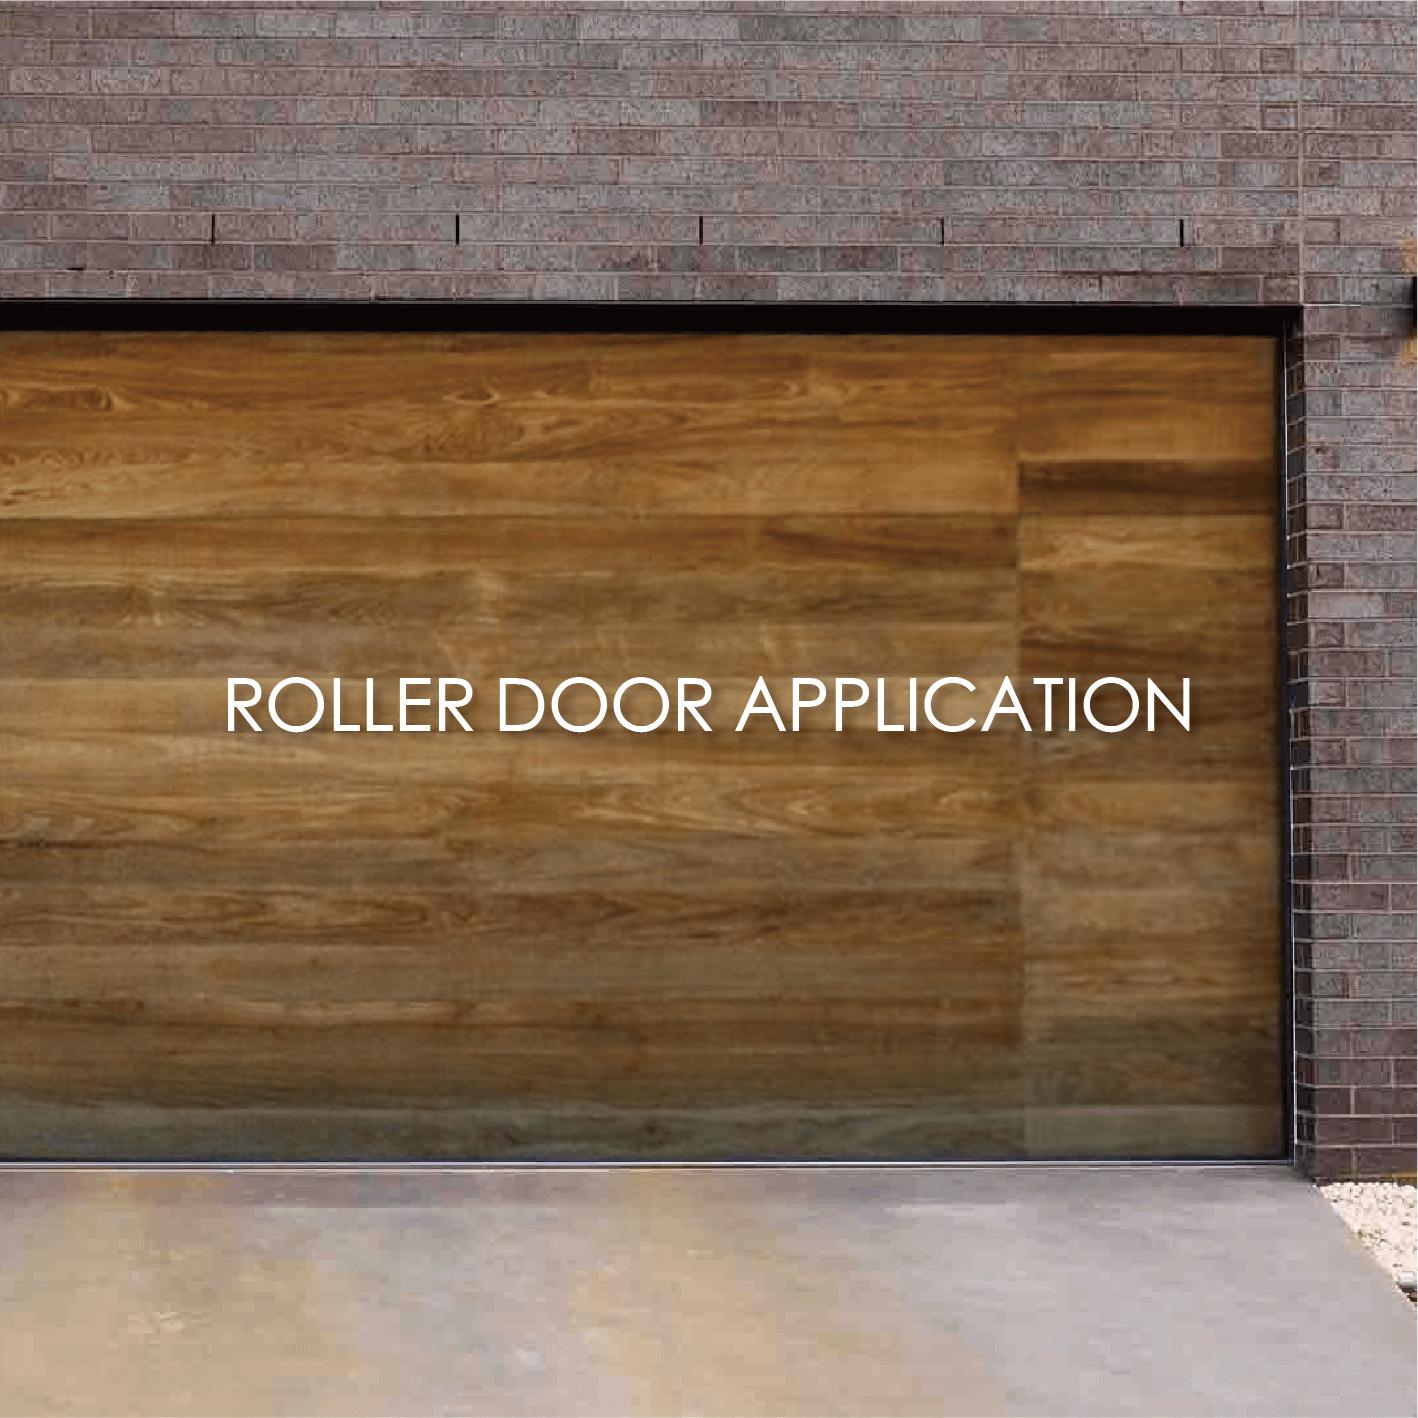 Wood grain coated metal decorative garage roll door can increase aesthetics and durability